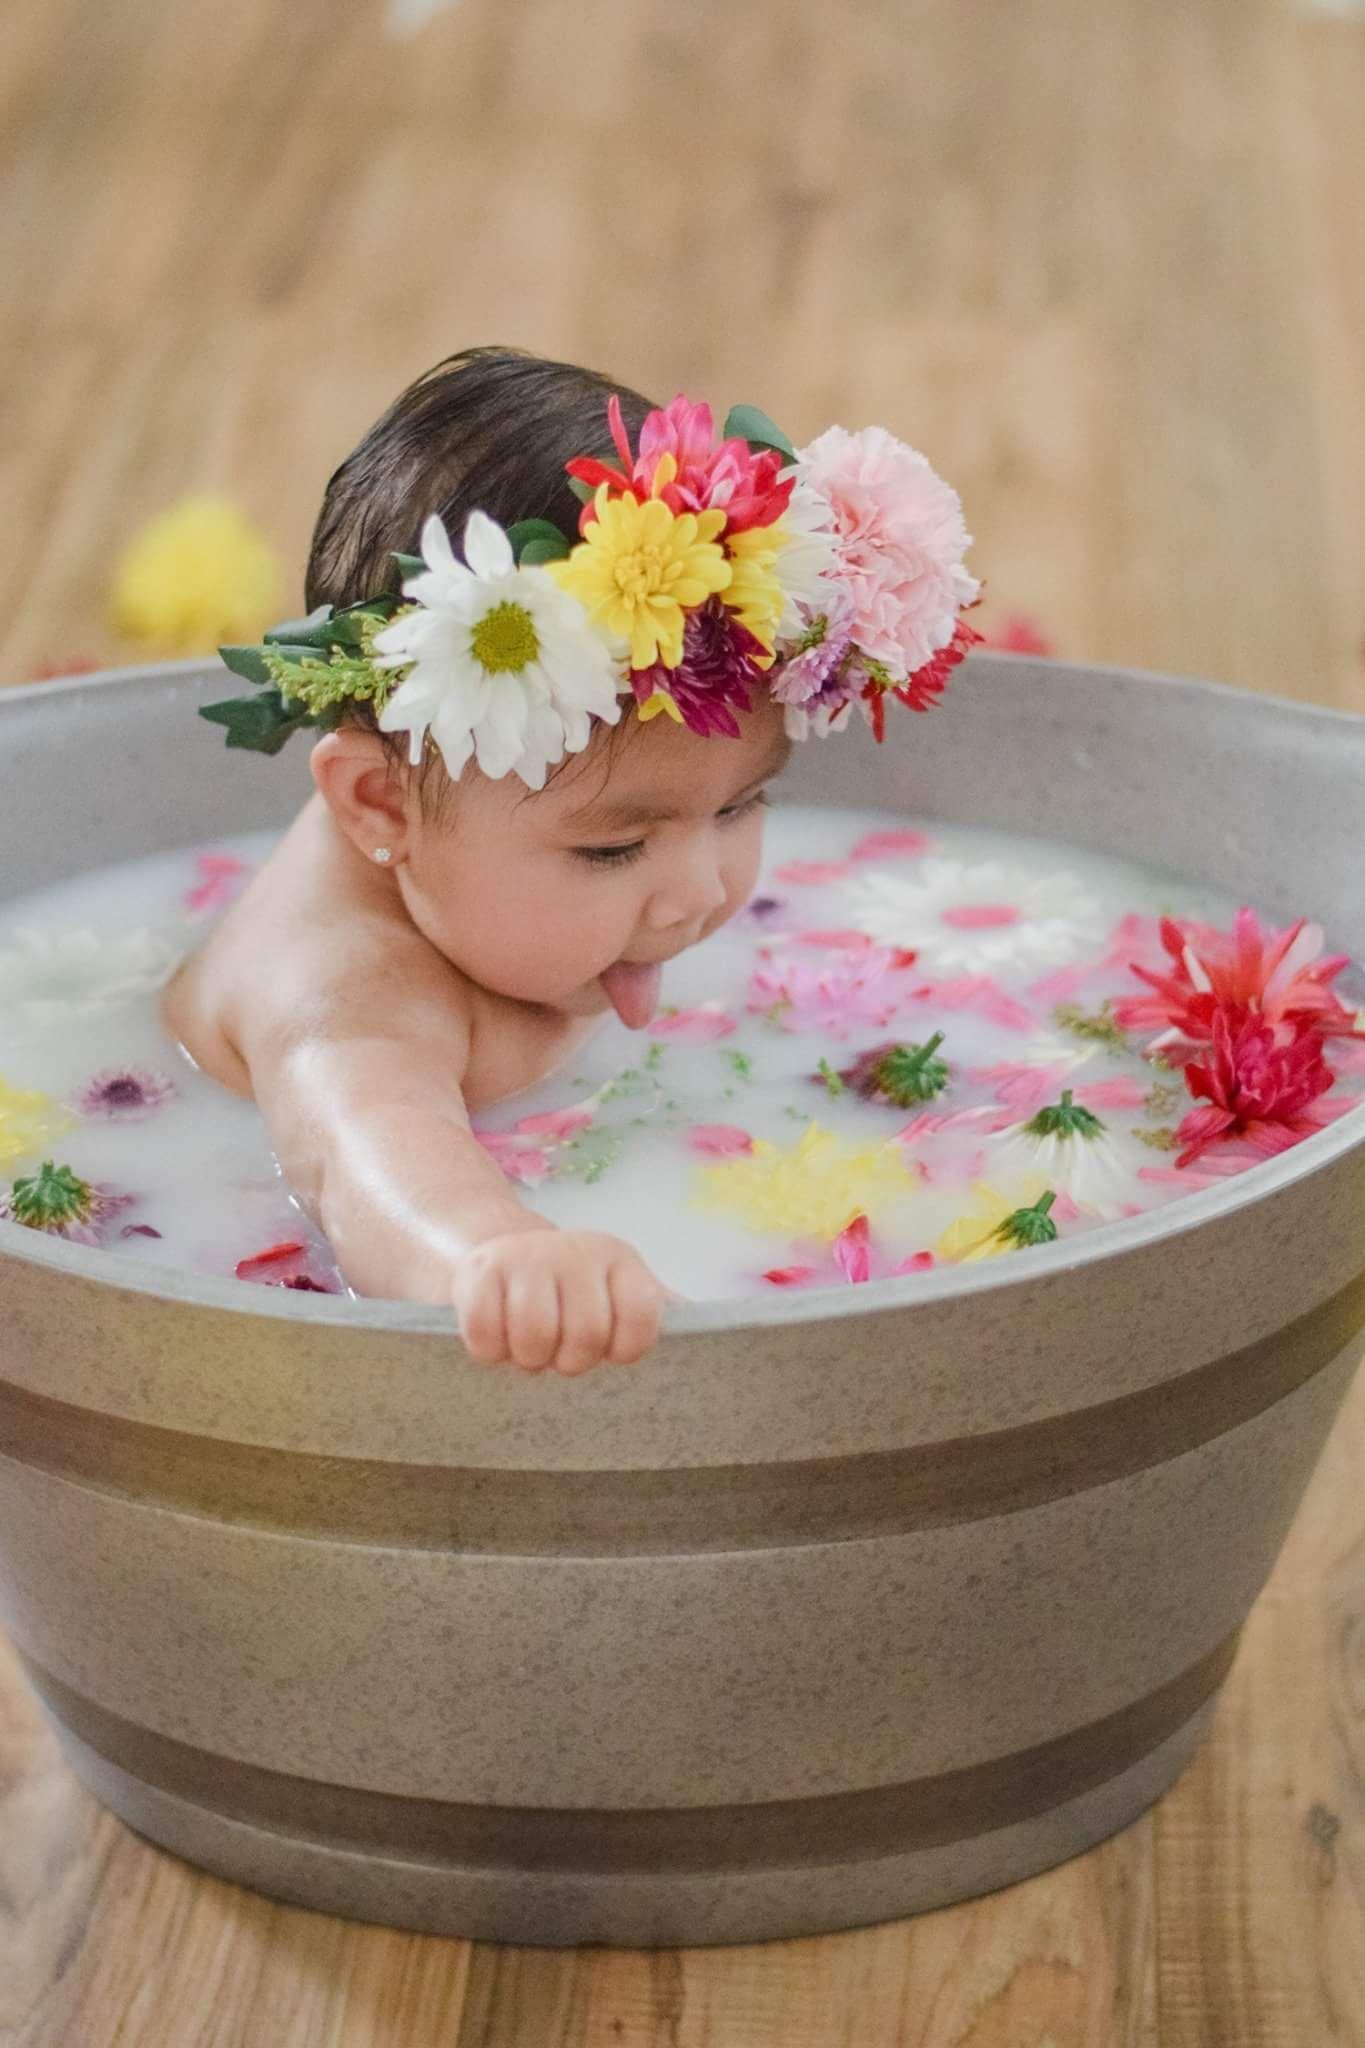 Milk bath photography #milkbath